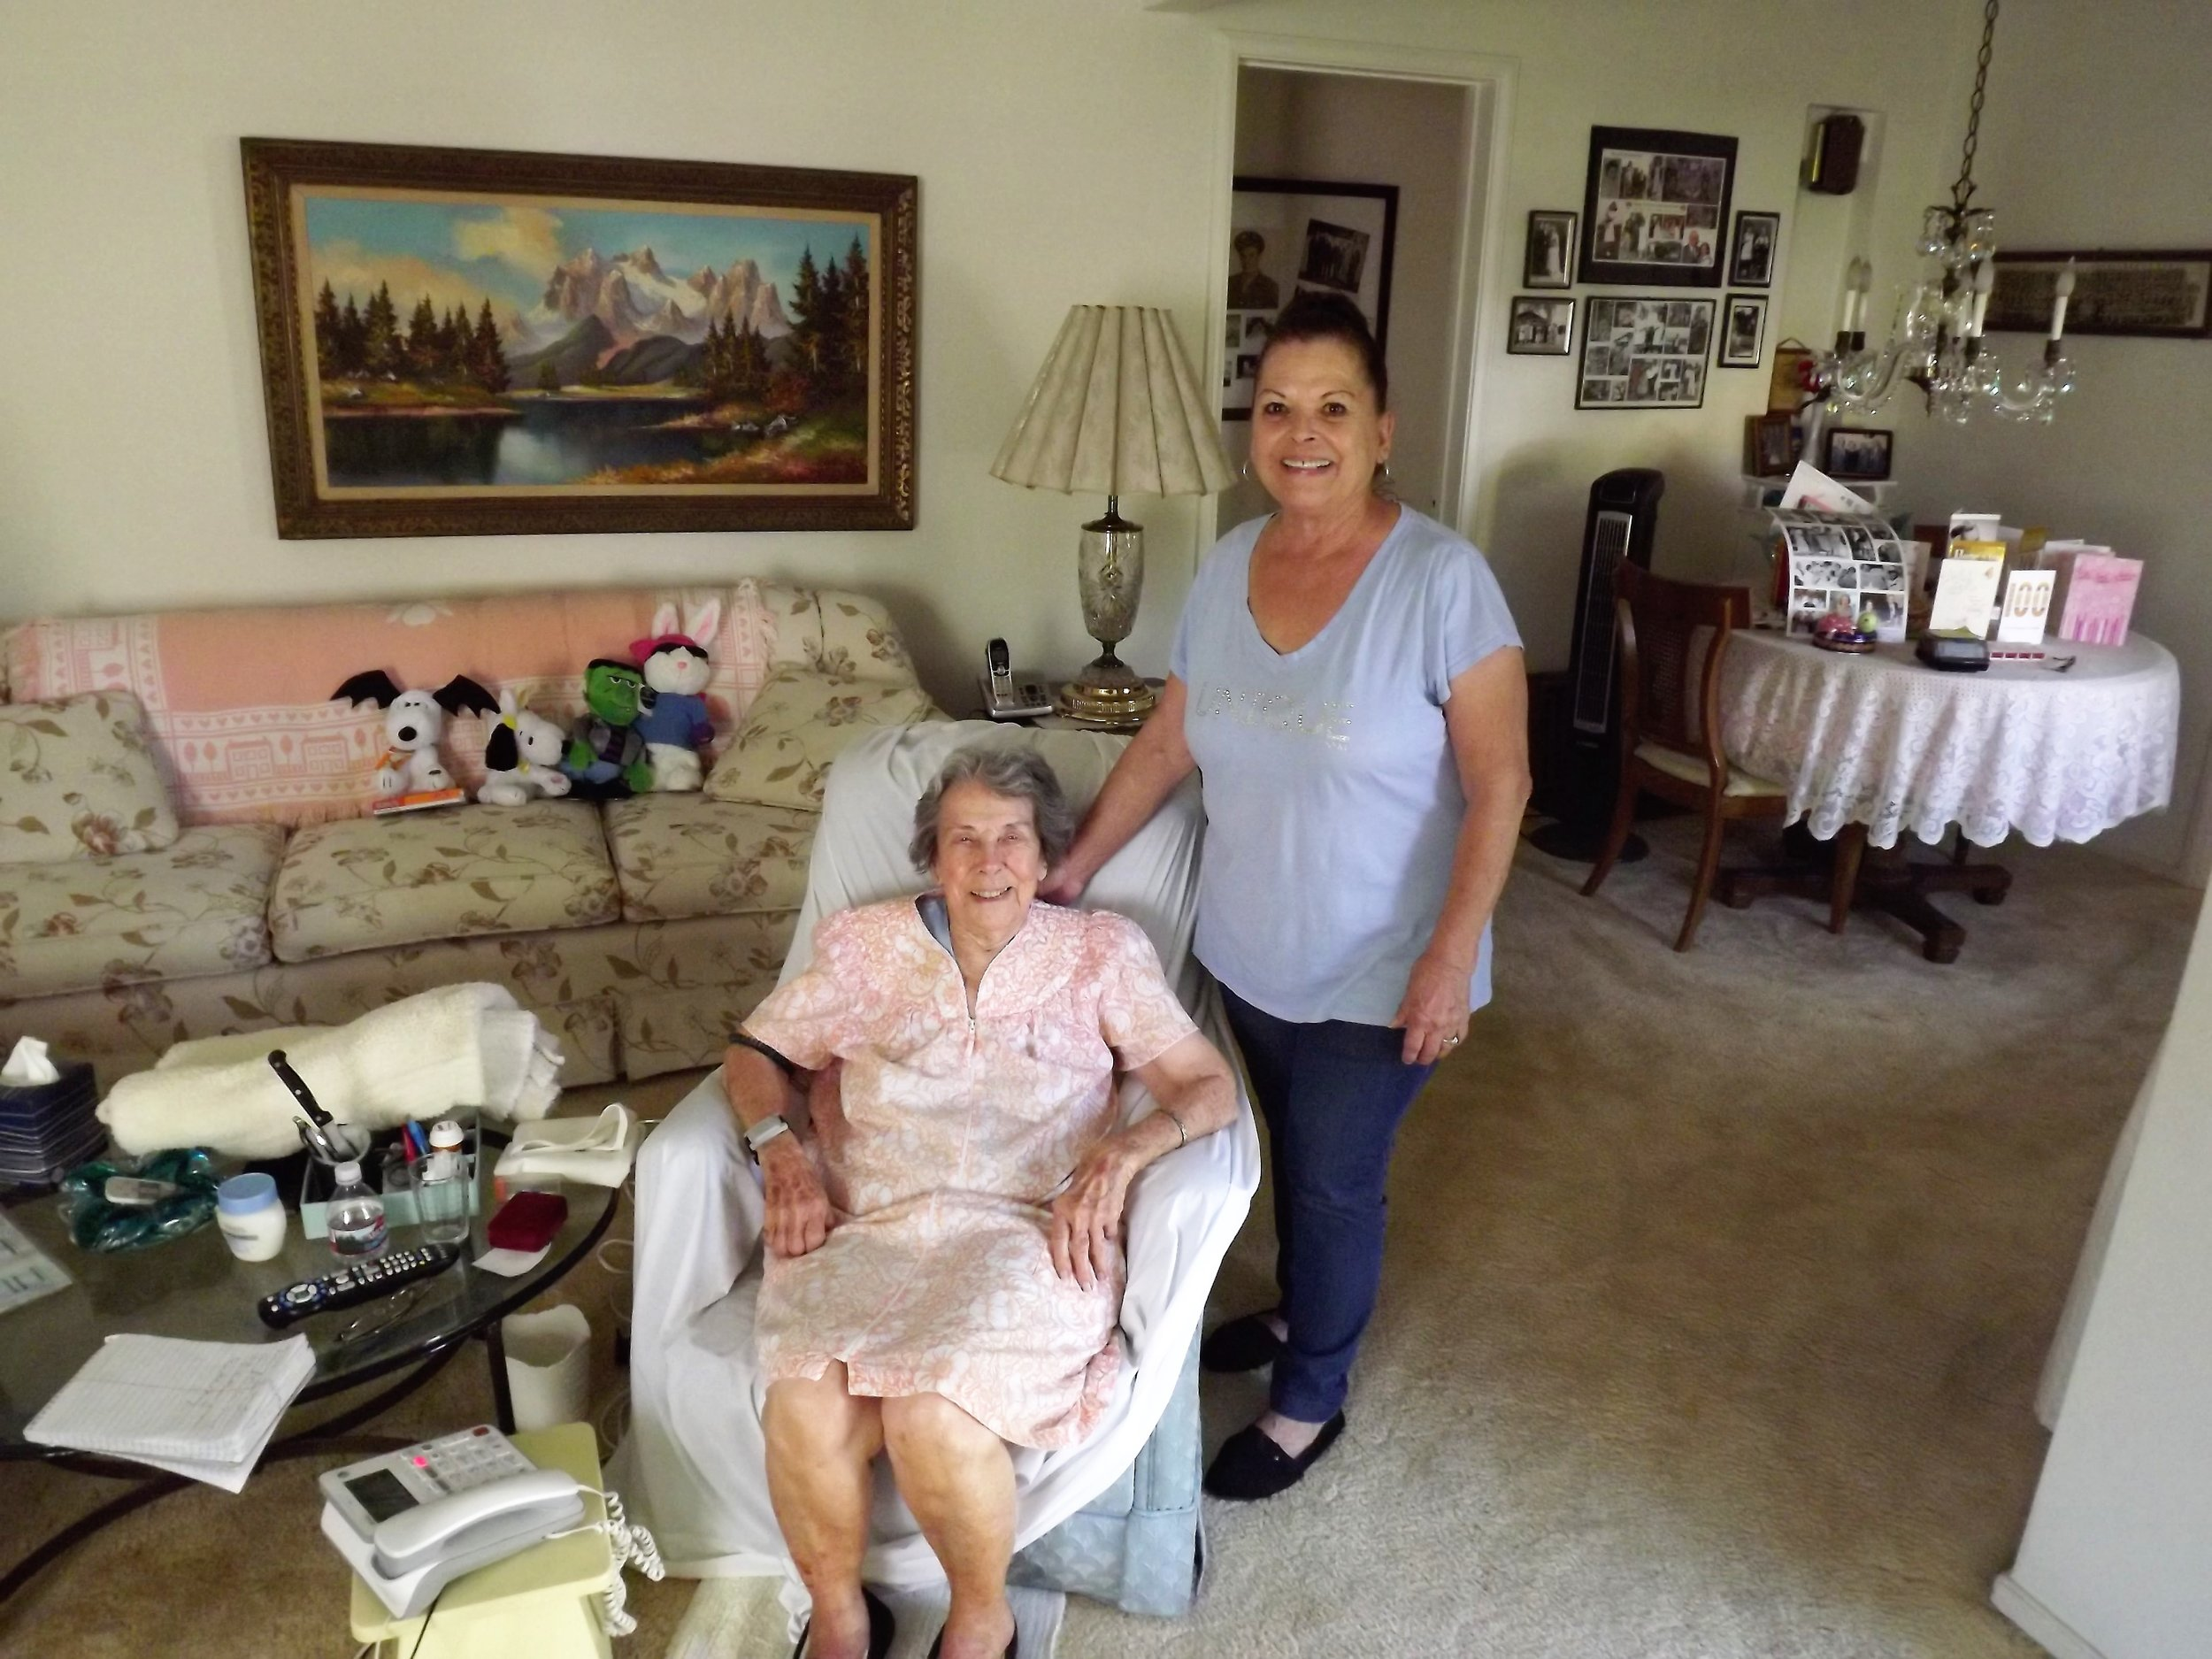 Rosie Viega with her neighbor, Judy Alvarez. Photos by Raul Samaniego